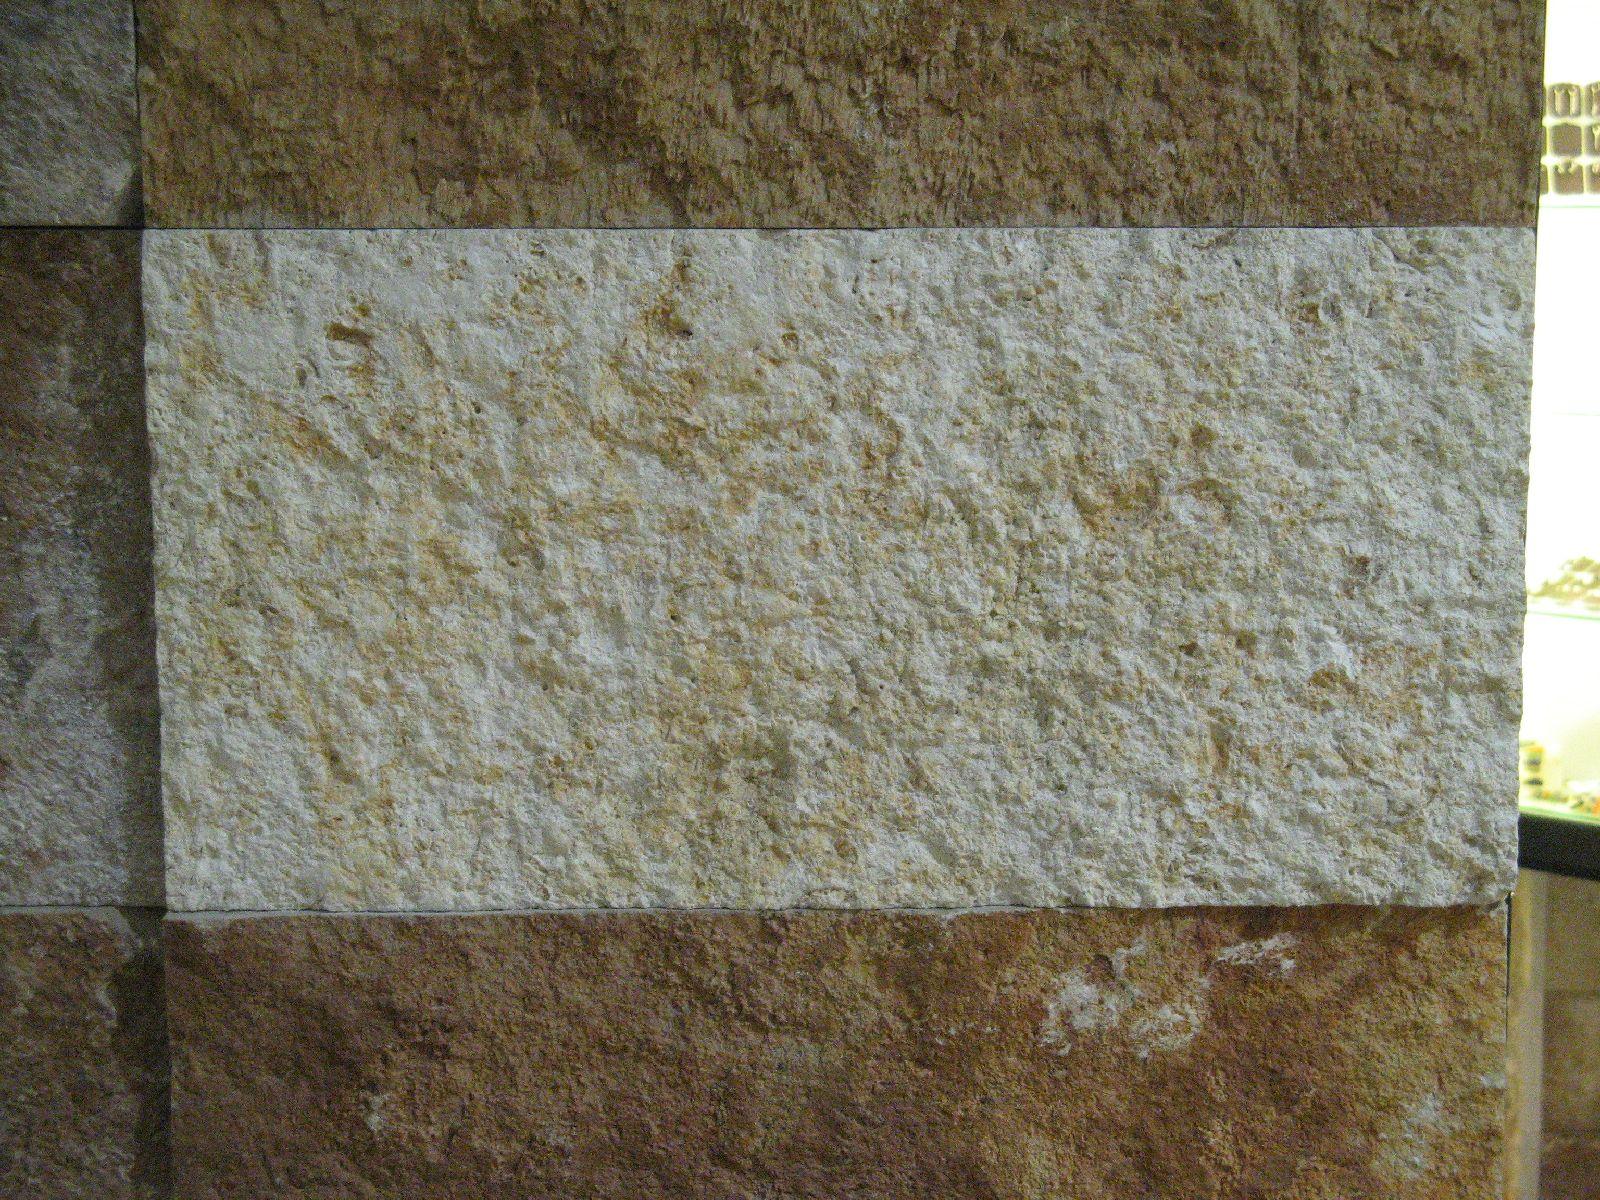 Stone_Texture_B_3707